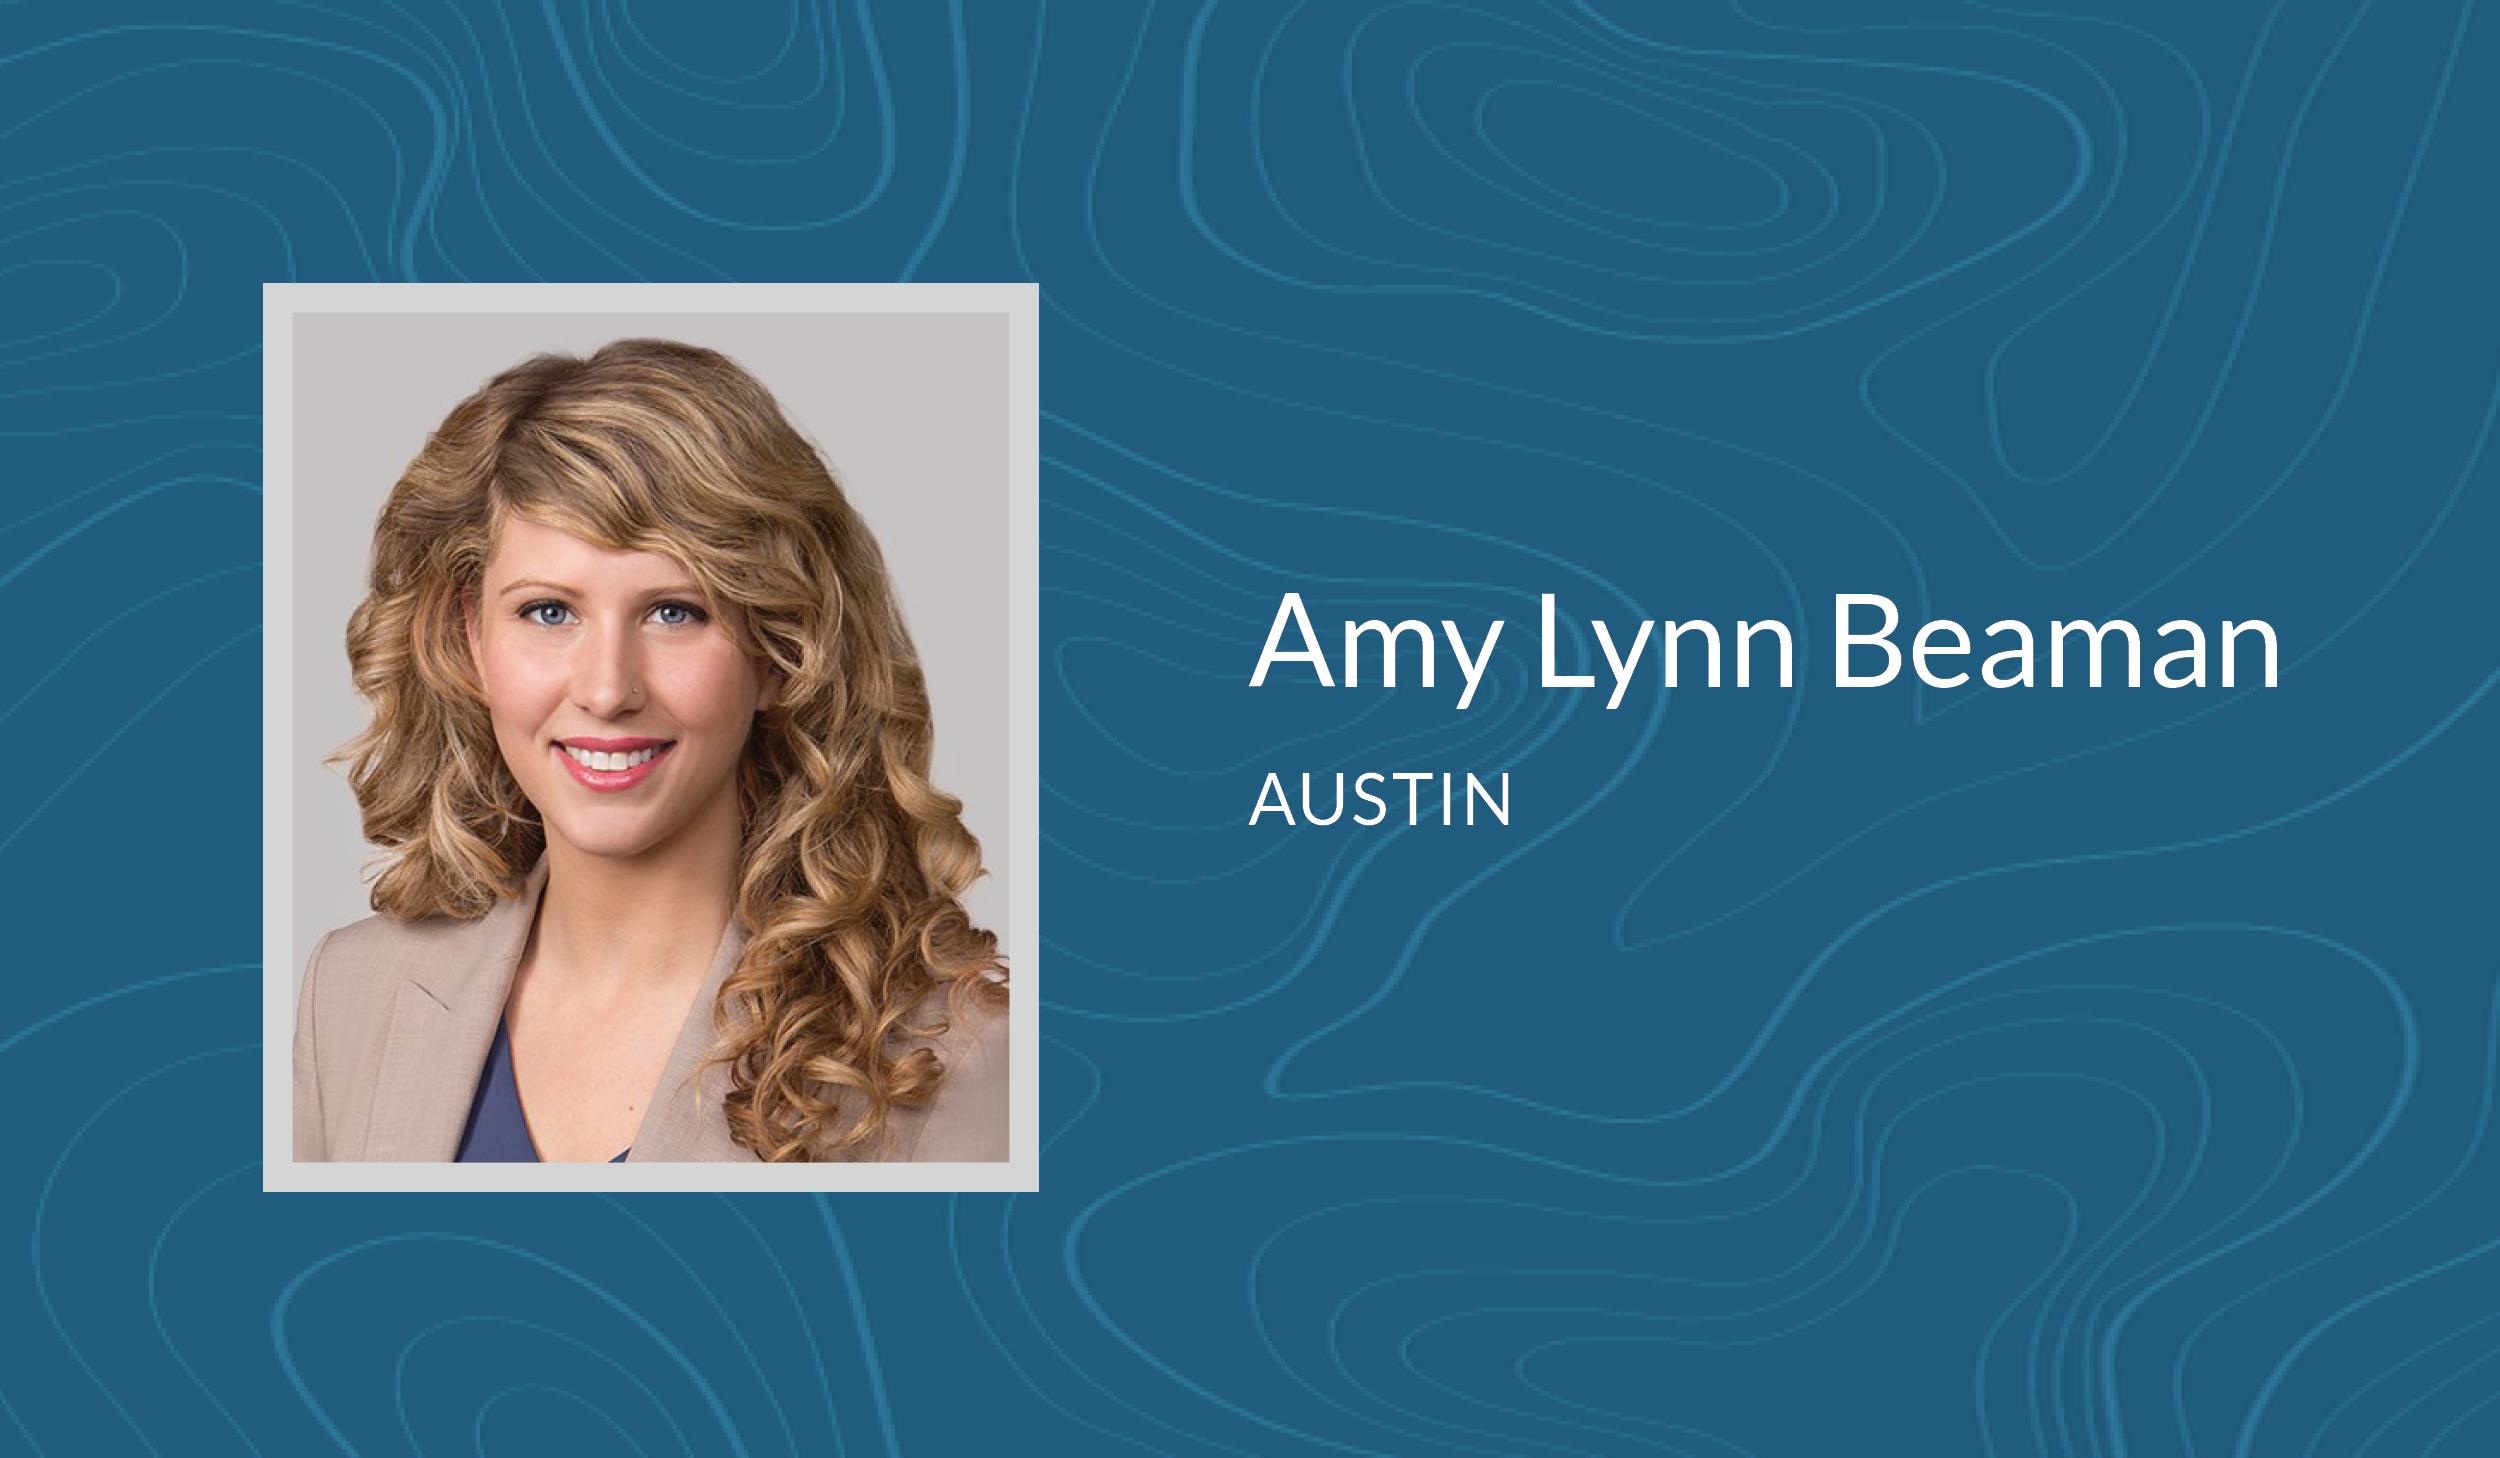 Amy Lynn Beaman Landing Page Headers.png